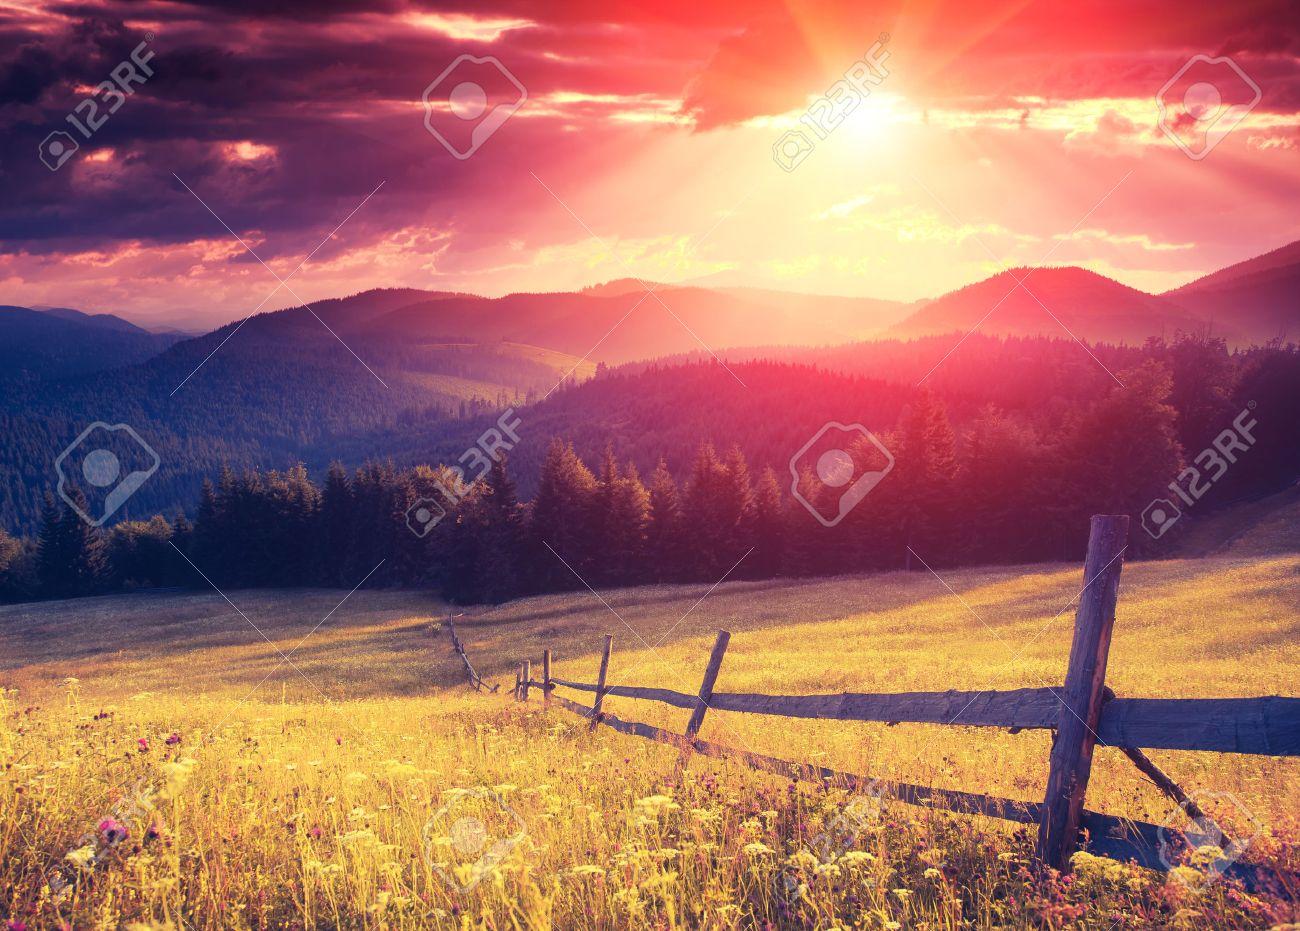 Fantastic sunny hills glowing by sunlight. Dramatic scenery. Carpathian, Ukraine, Europe. Beauty world. Retro style filter. Instagram colorful toning effect. - 47565755